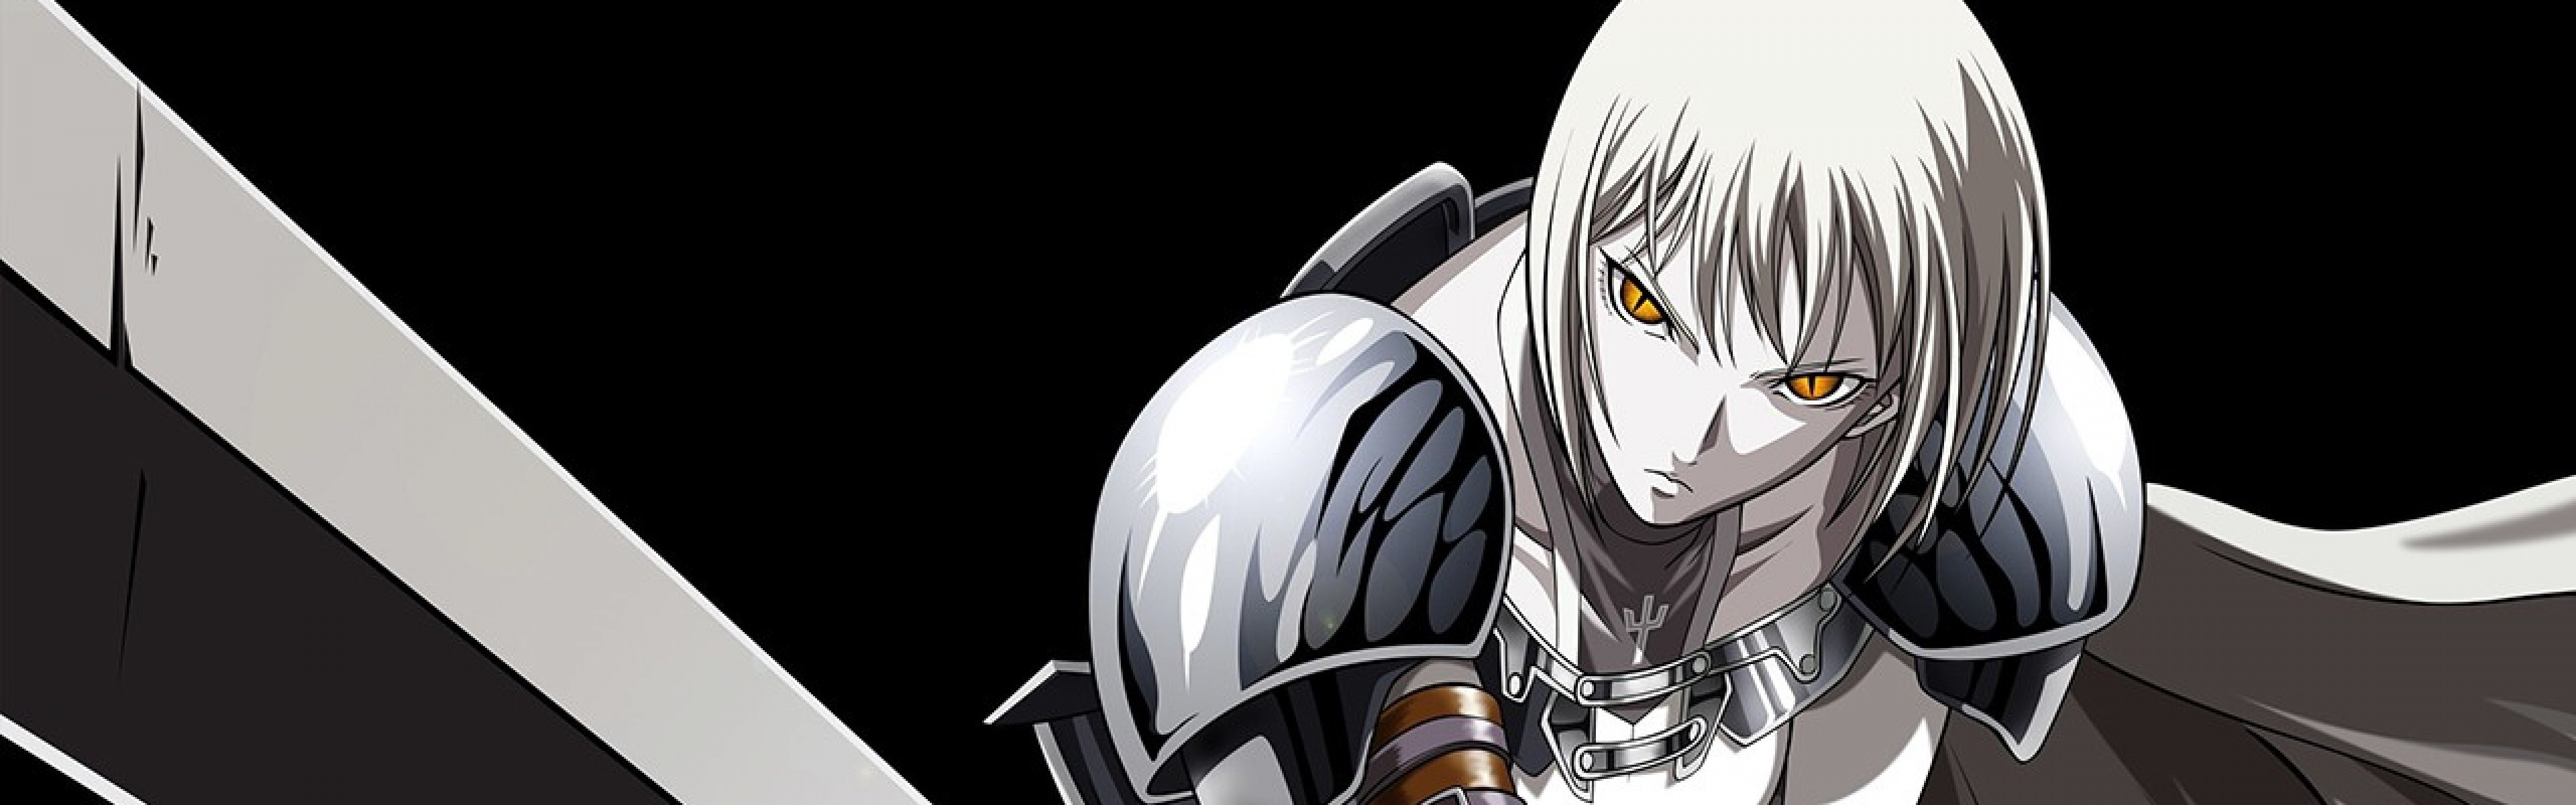 Wallpaper anime, warrior, sword, posture, background